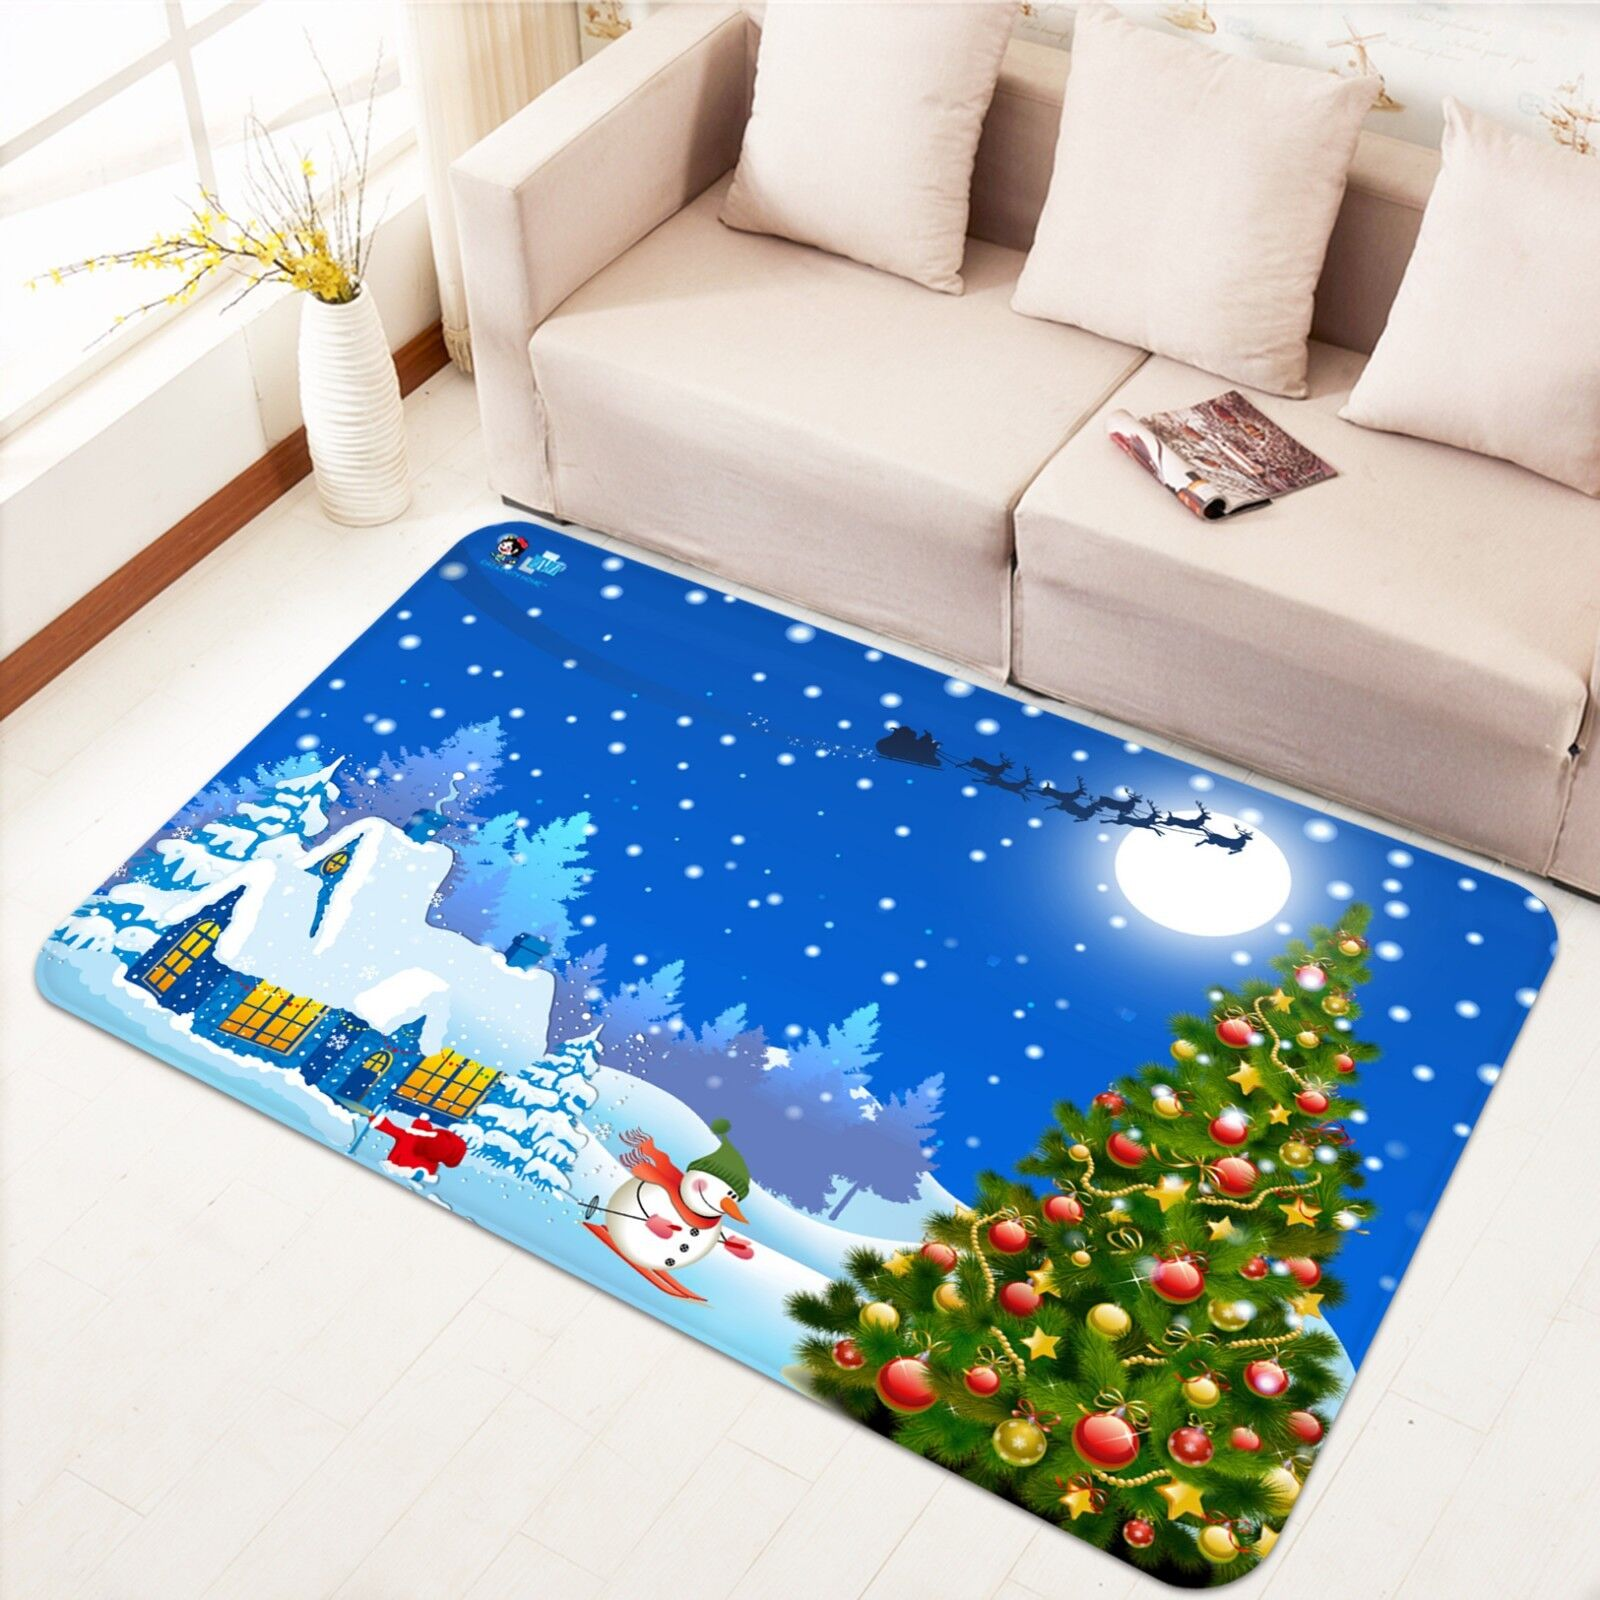 3D Navidad Navidad 20 Alfombra Colchoneta Antideslizante Alfombra De Sala Elegante De Calidad Foto Alfombra